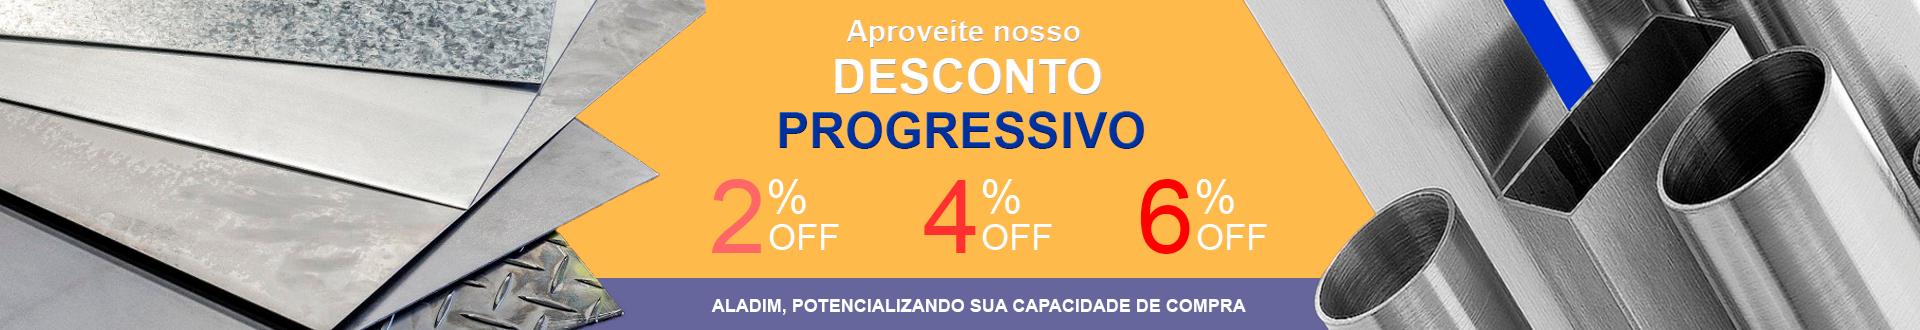 2019-02-11-banner-1920x330-fundo-laranja---desconto-progressivo---2-4-6%